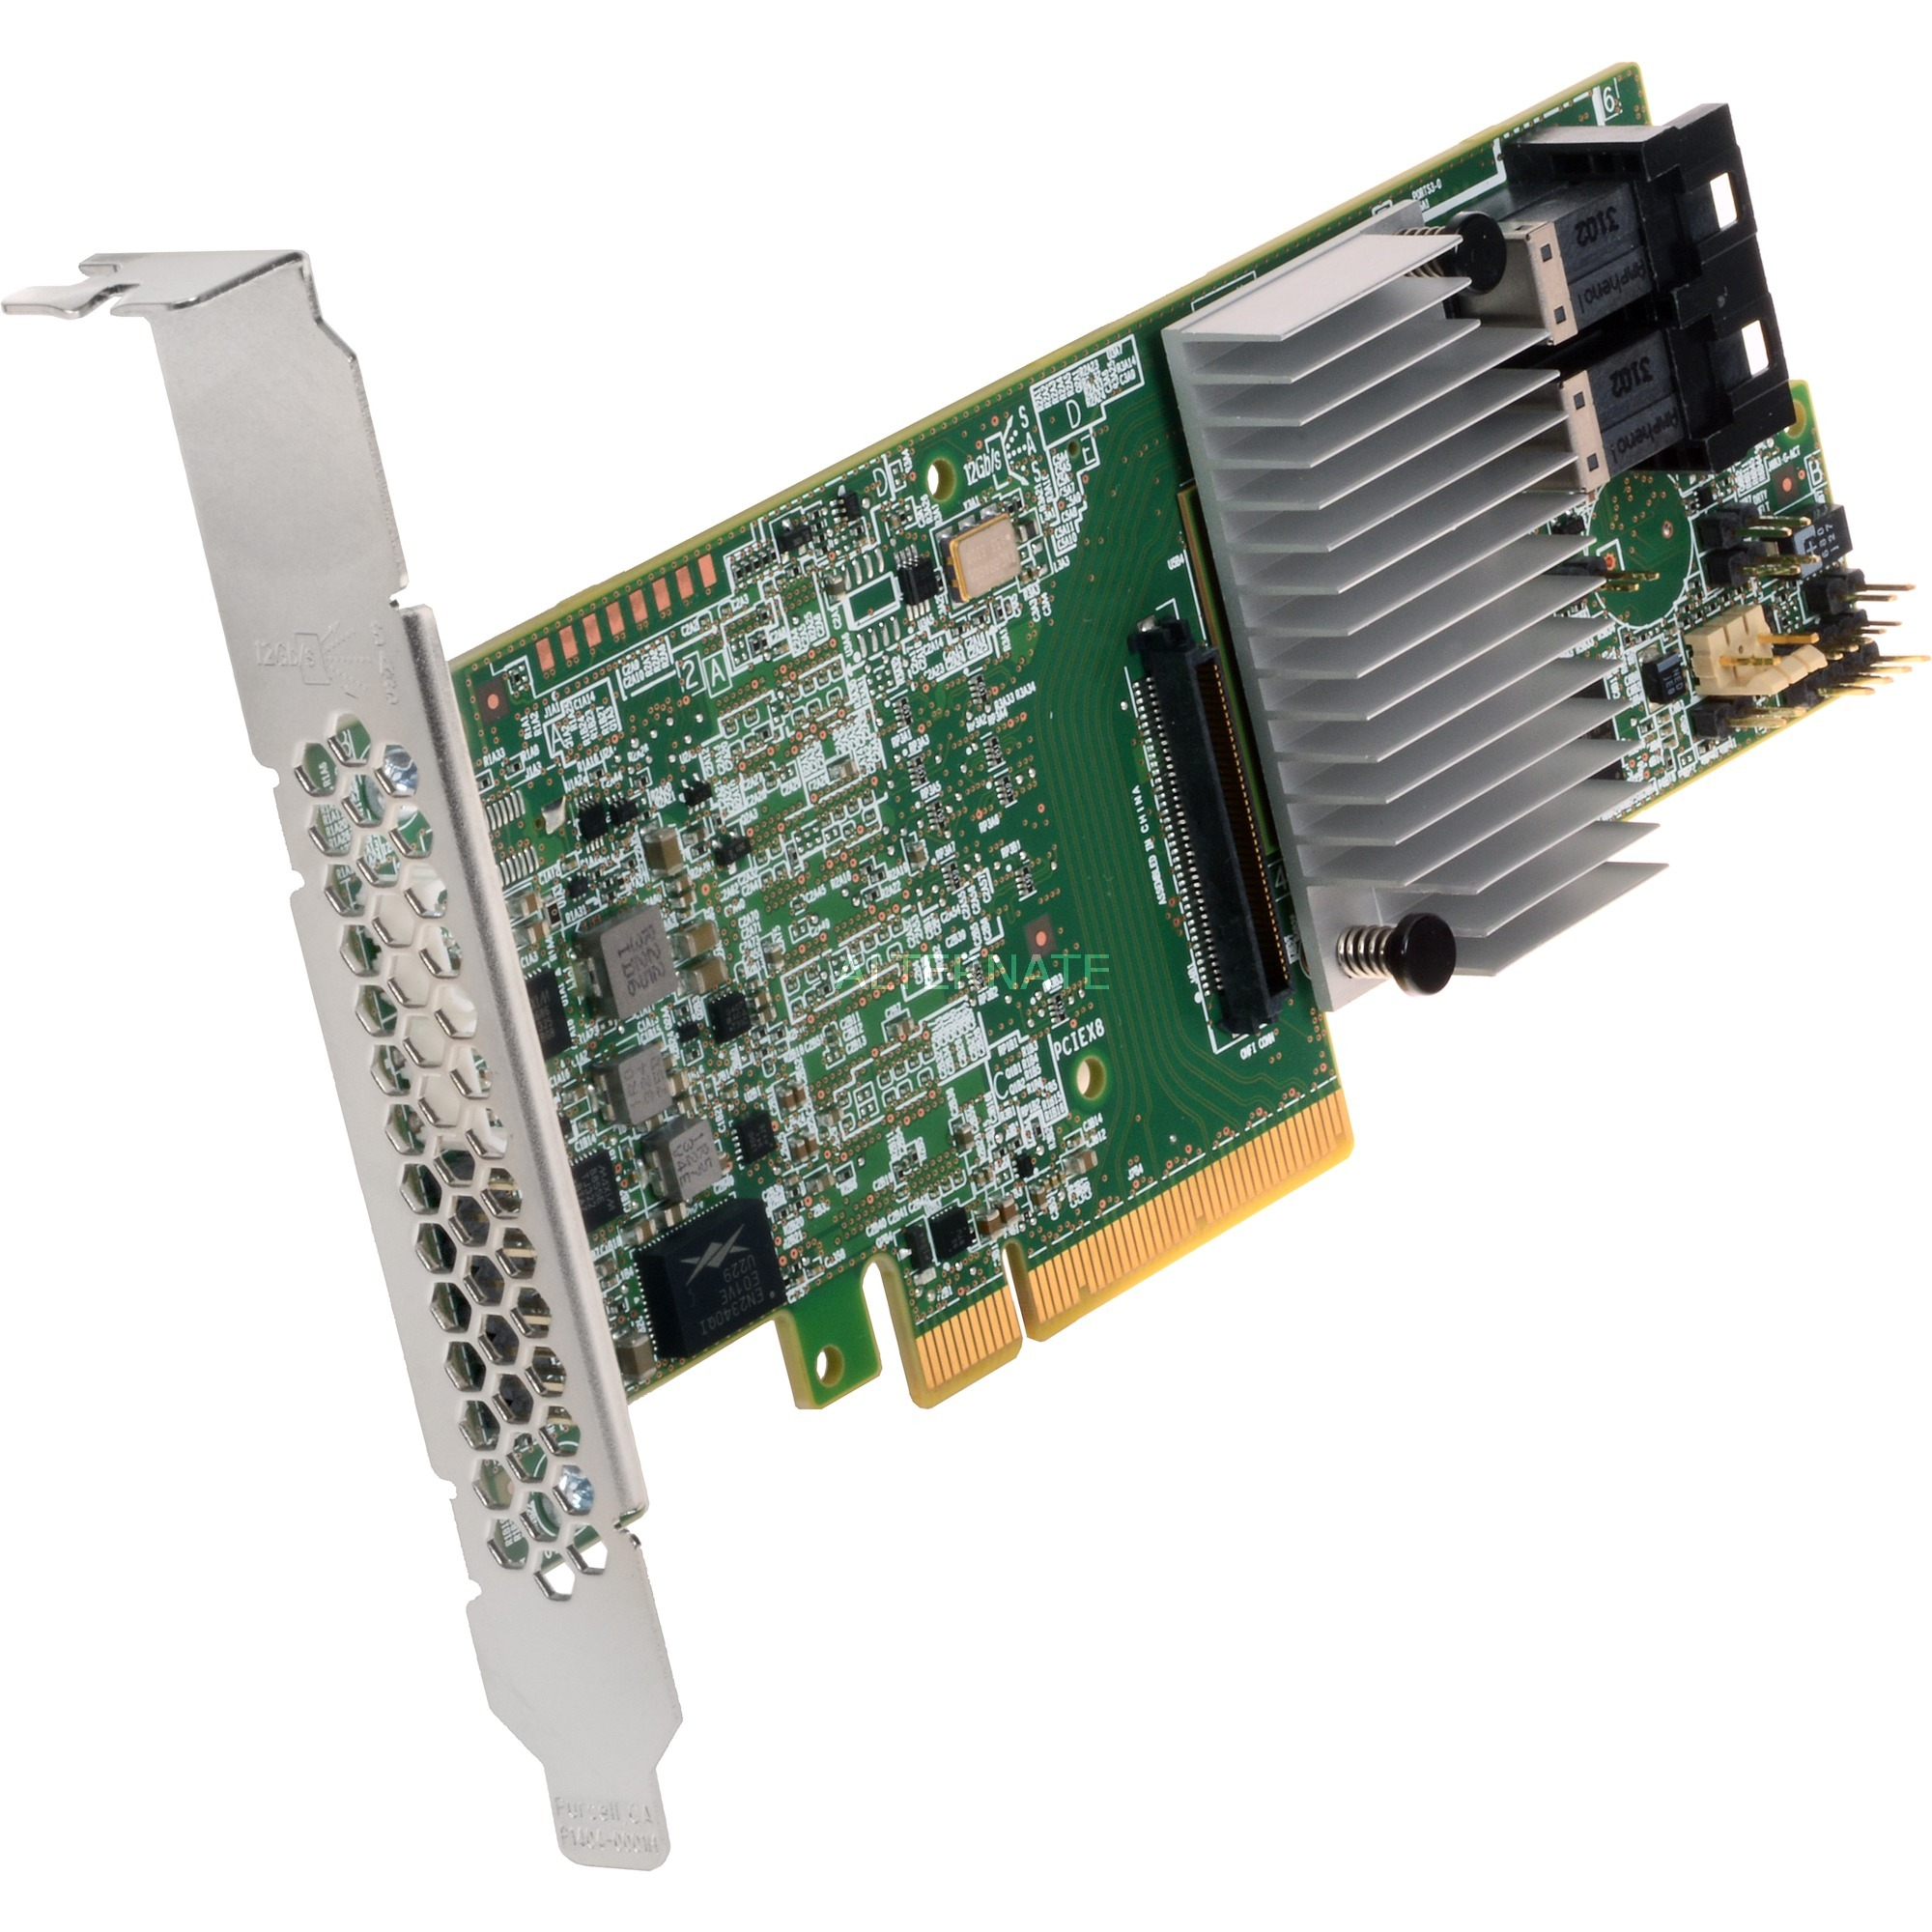 MegaRAID SAS 9361-8i PCI Express x8 12Gbit/s controlado RAID, Controlador